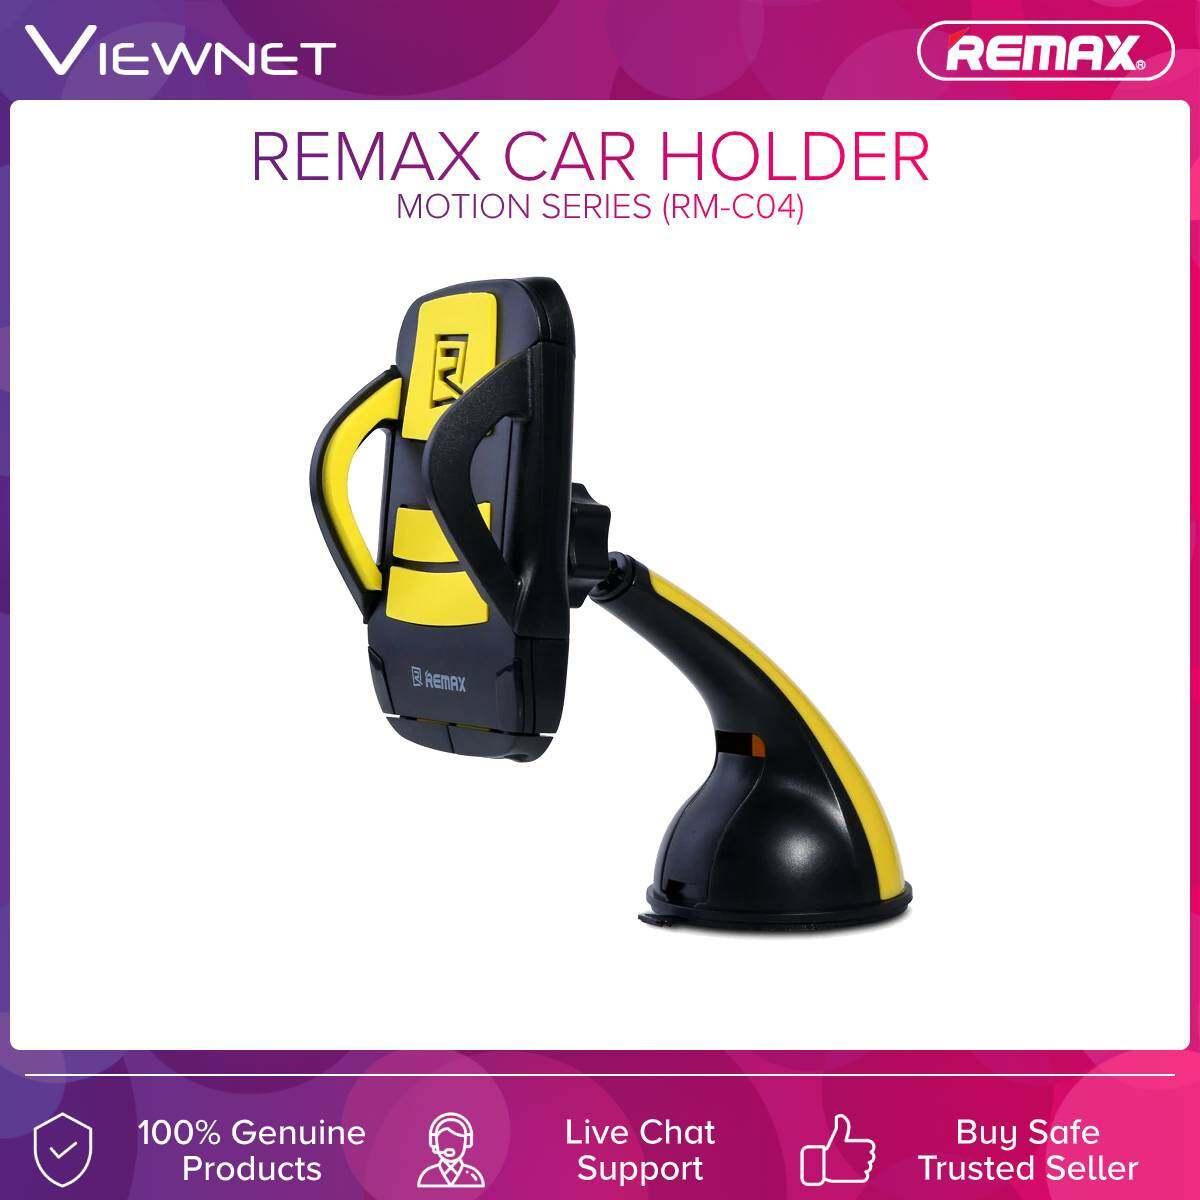 Remax (RM-C04) Car Holder Motion Series